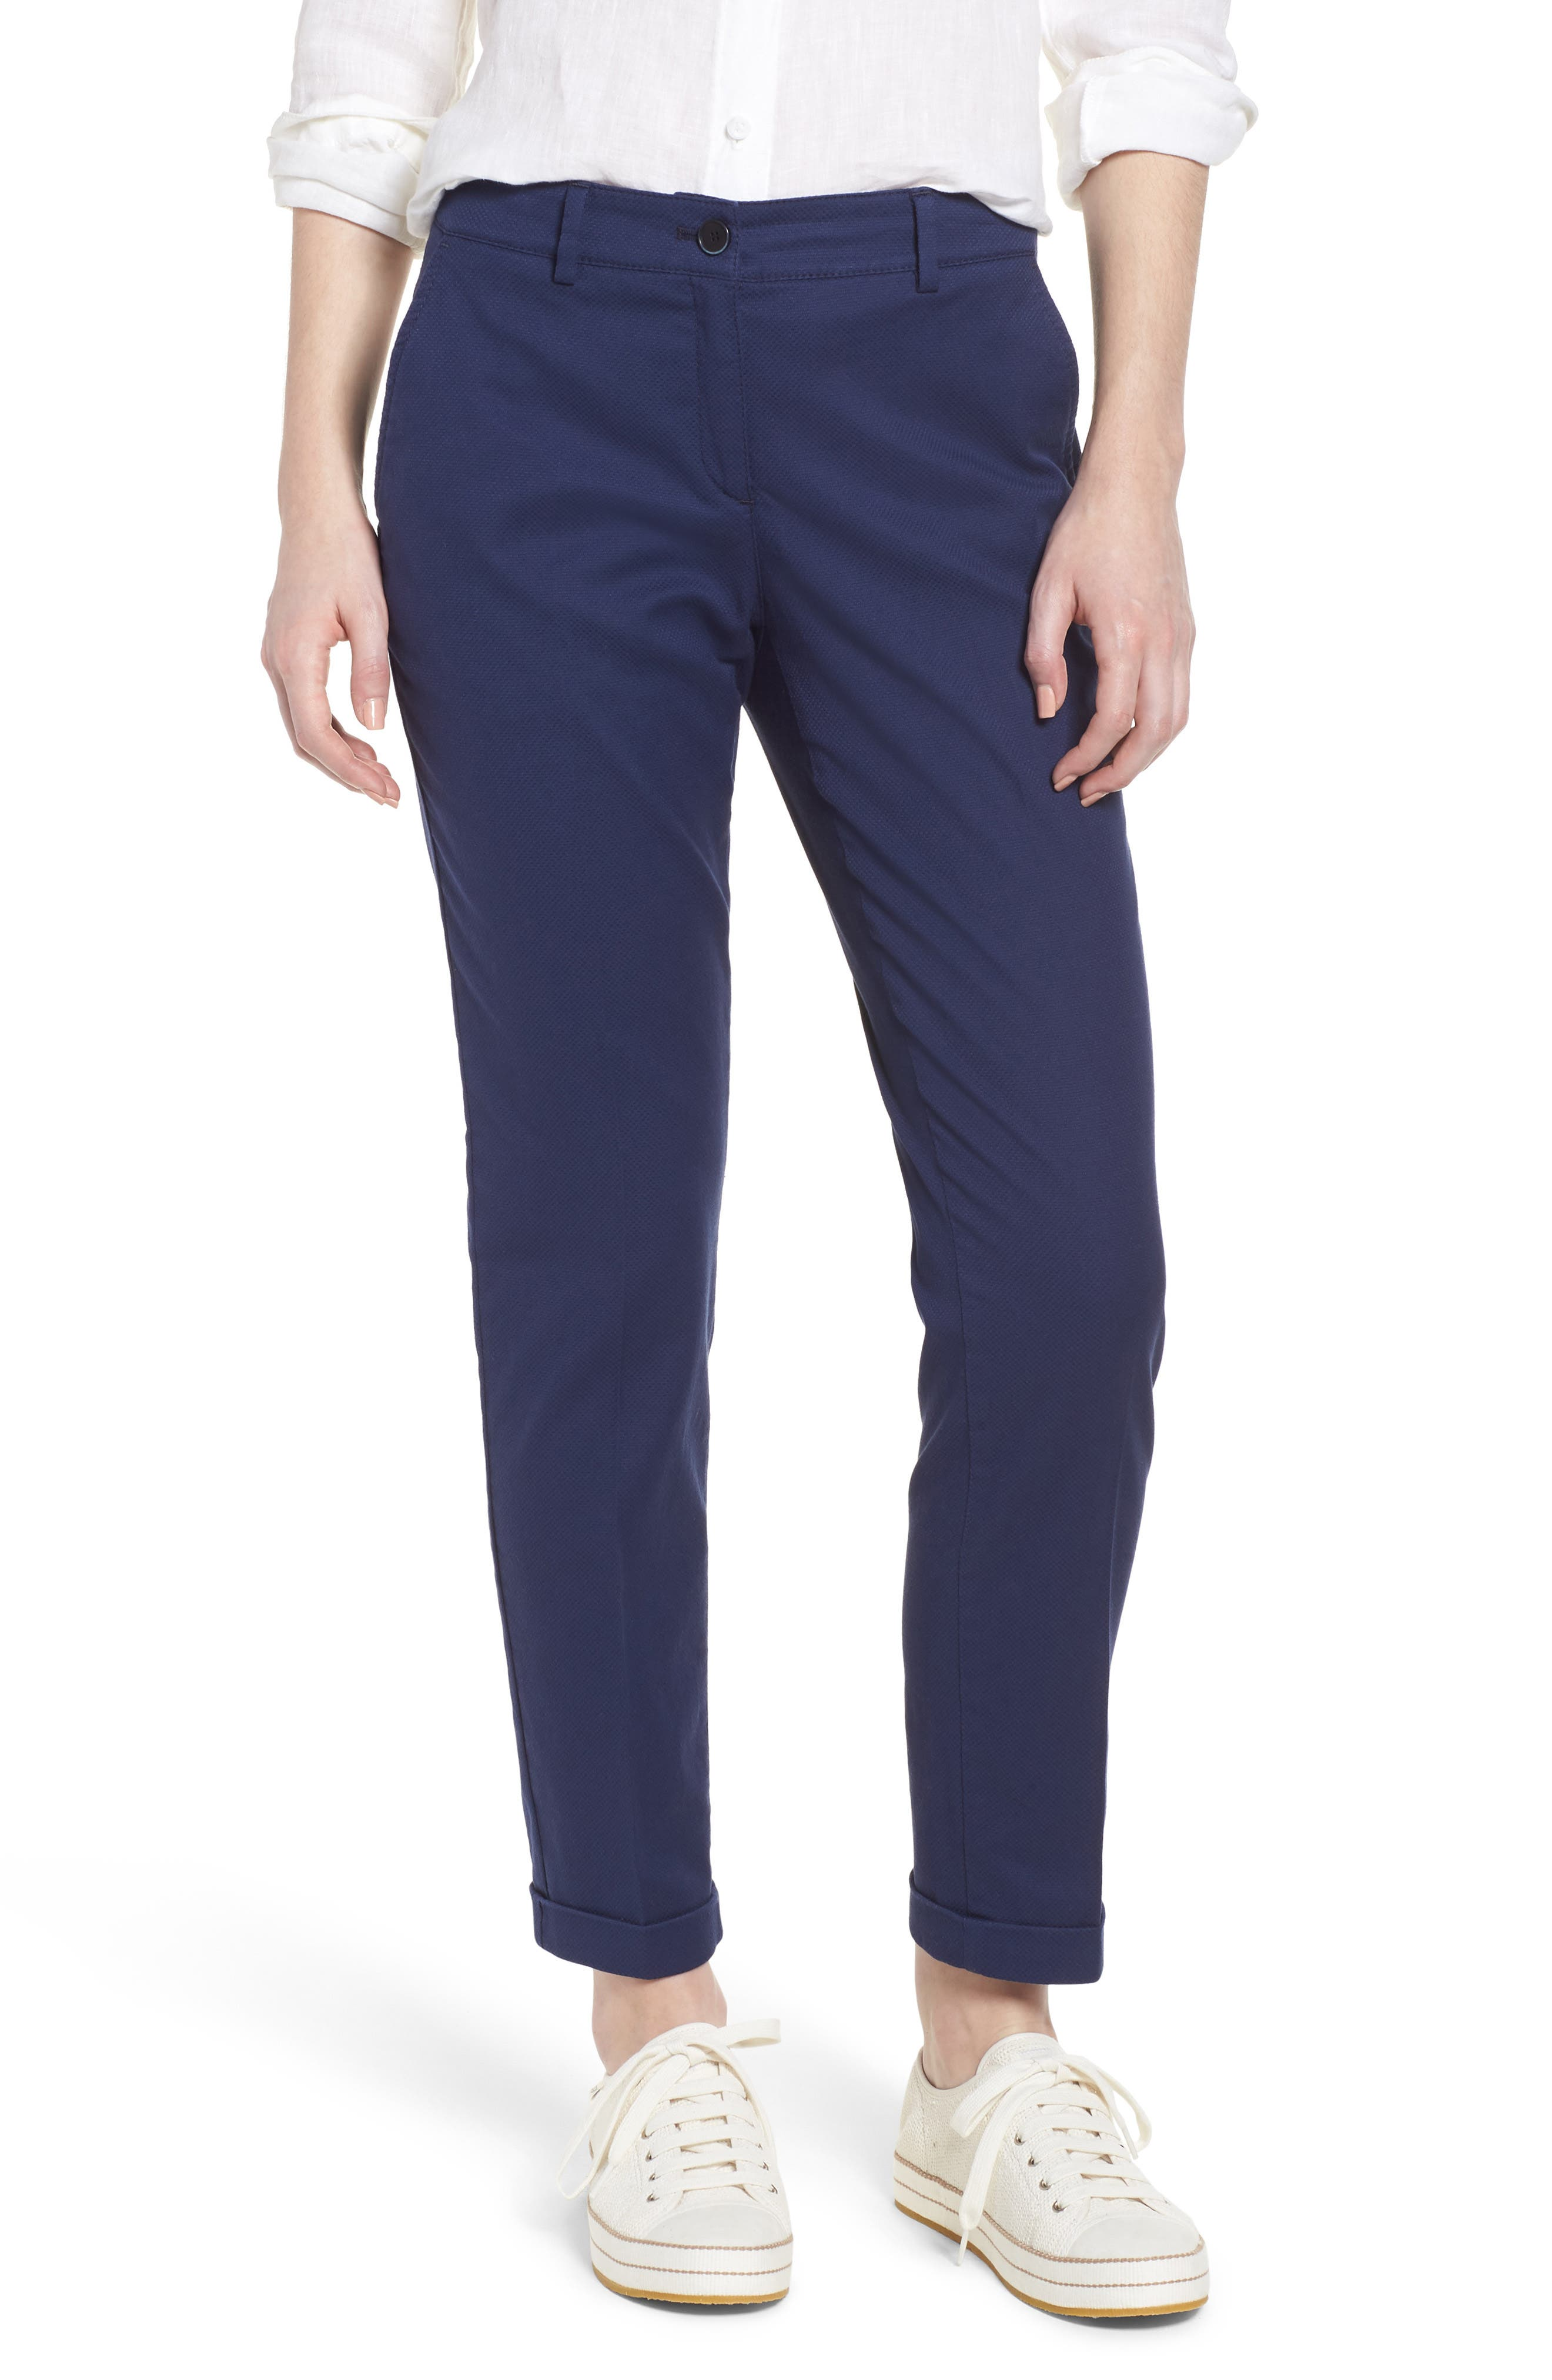 Maron Cuffed Straight Leg Pants,                         Main,                         color, Navy